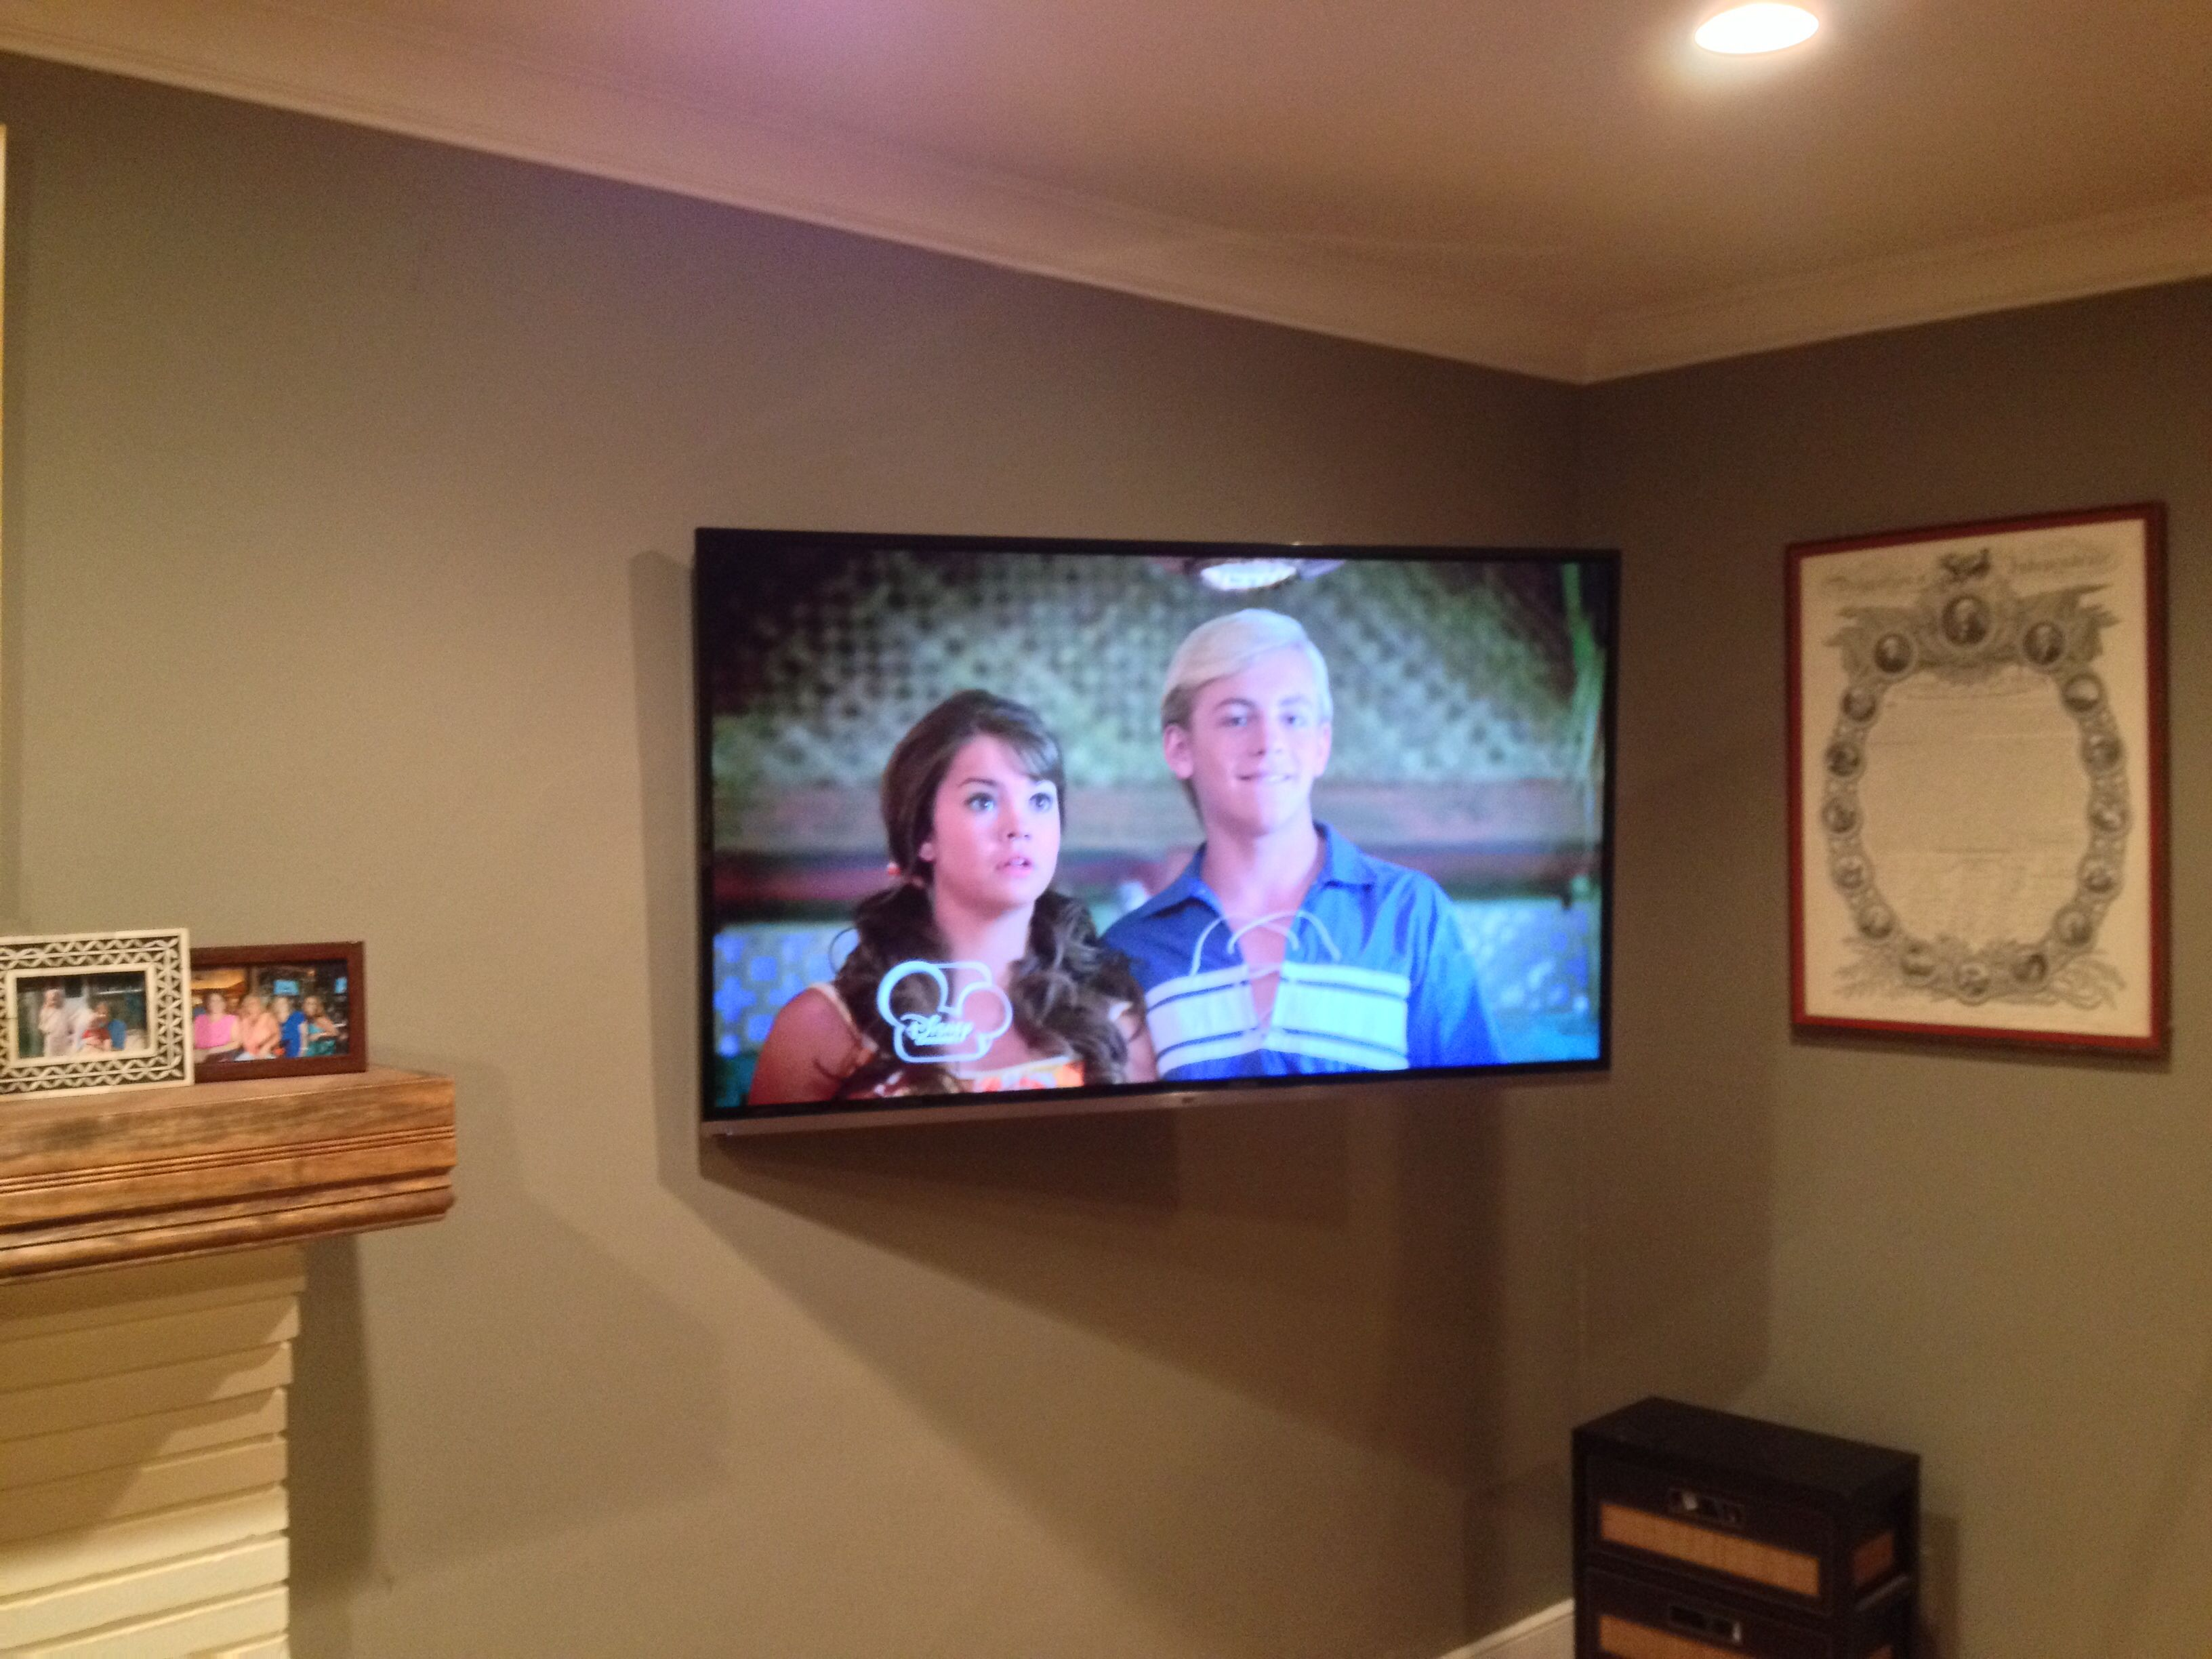 Corner Wall Mount For Flat Screen TV